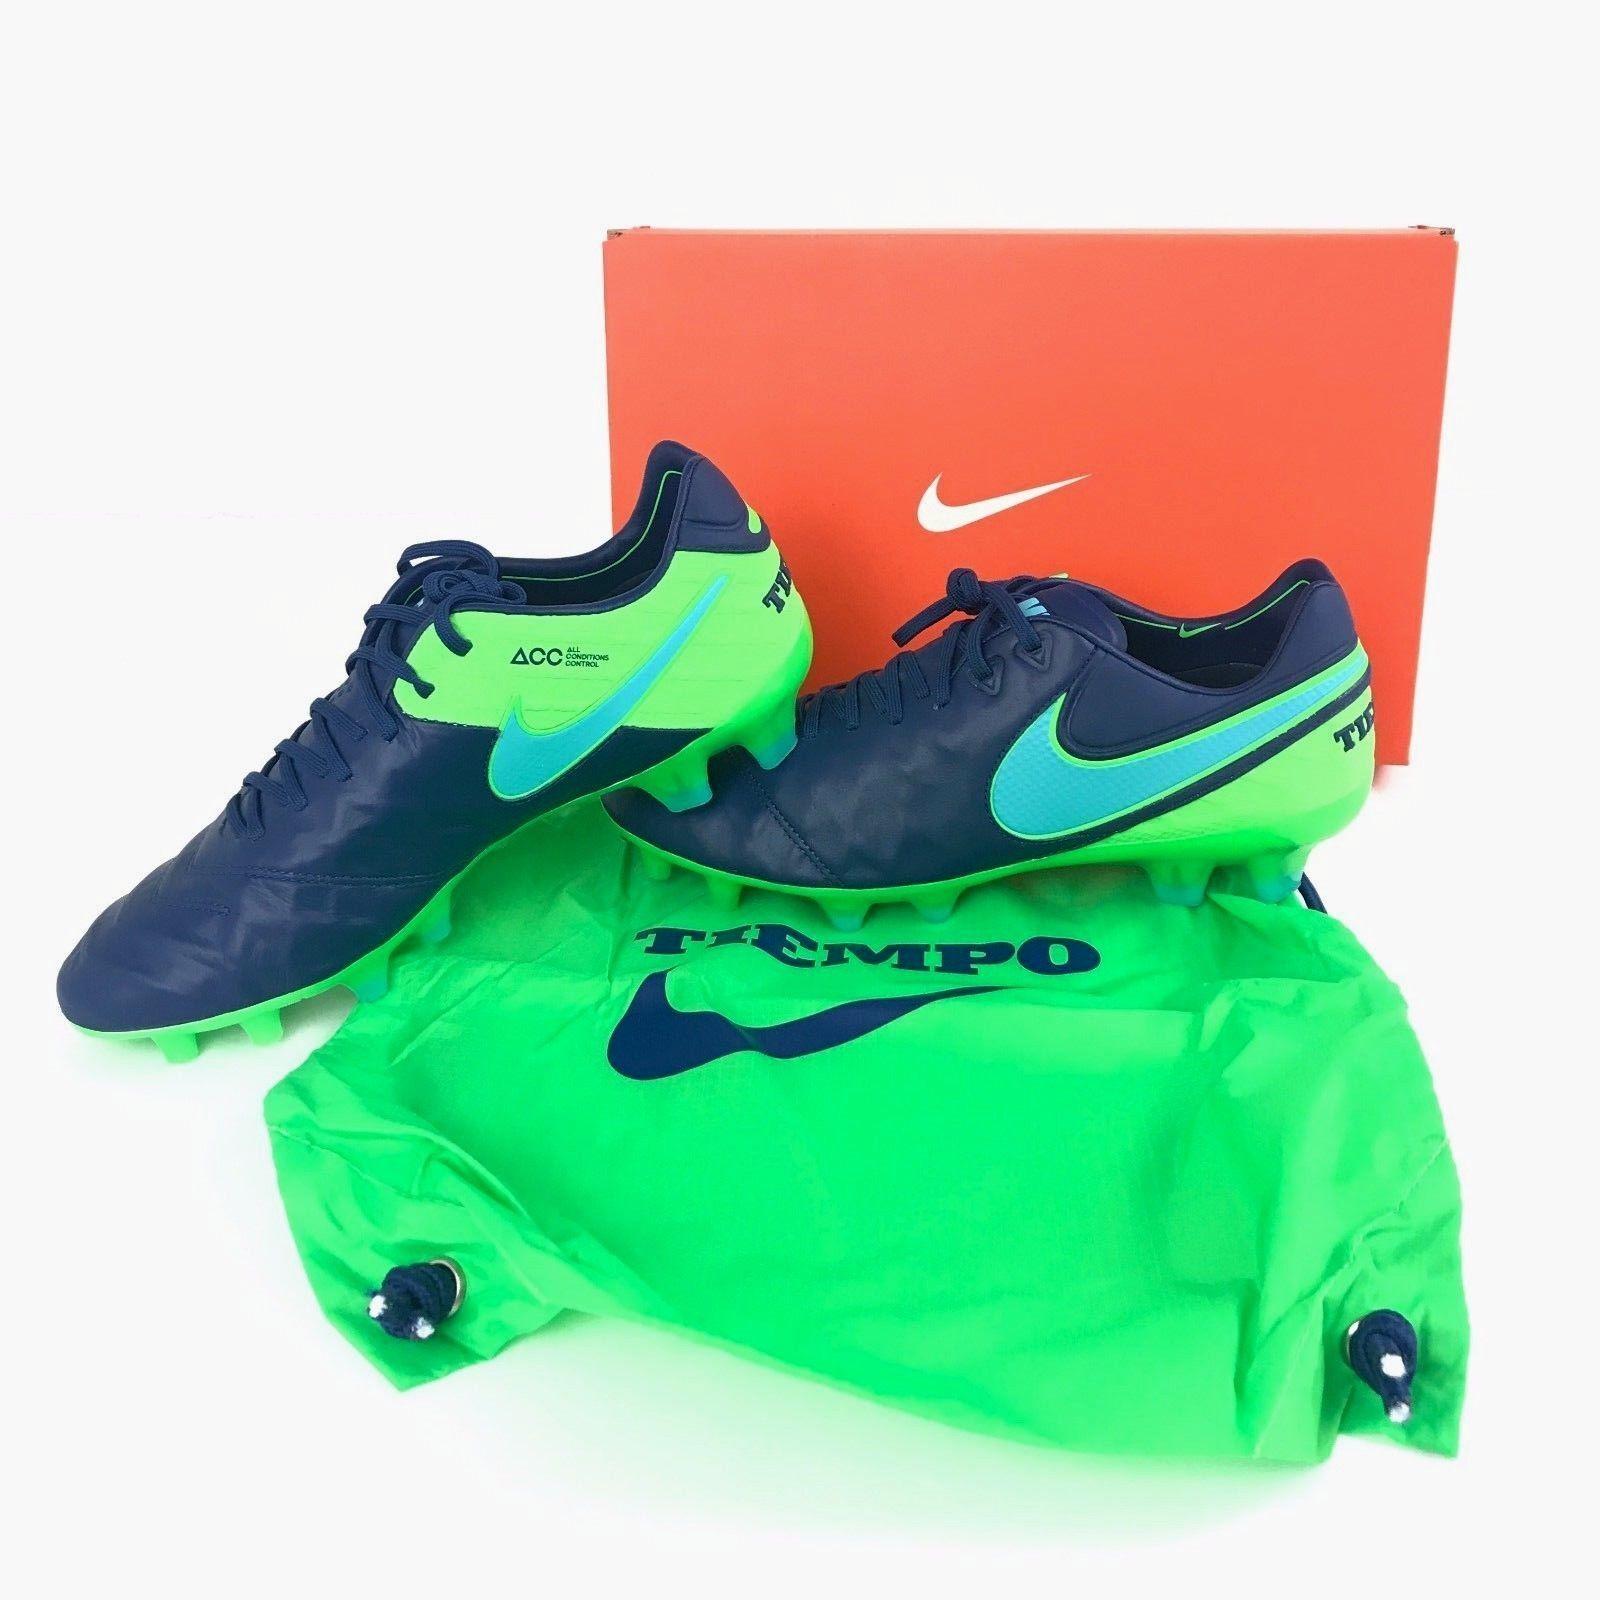 Nike Tiempo Legend Vi Fg Fútbol Tacos Costa Azul 819177-443 Talla 5.5